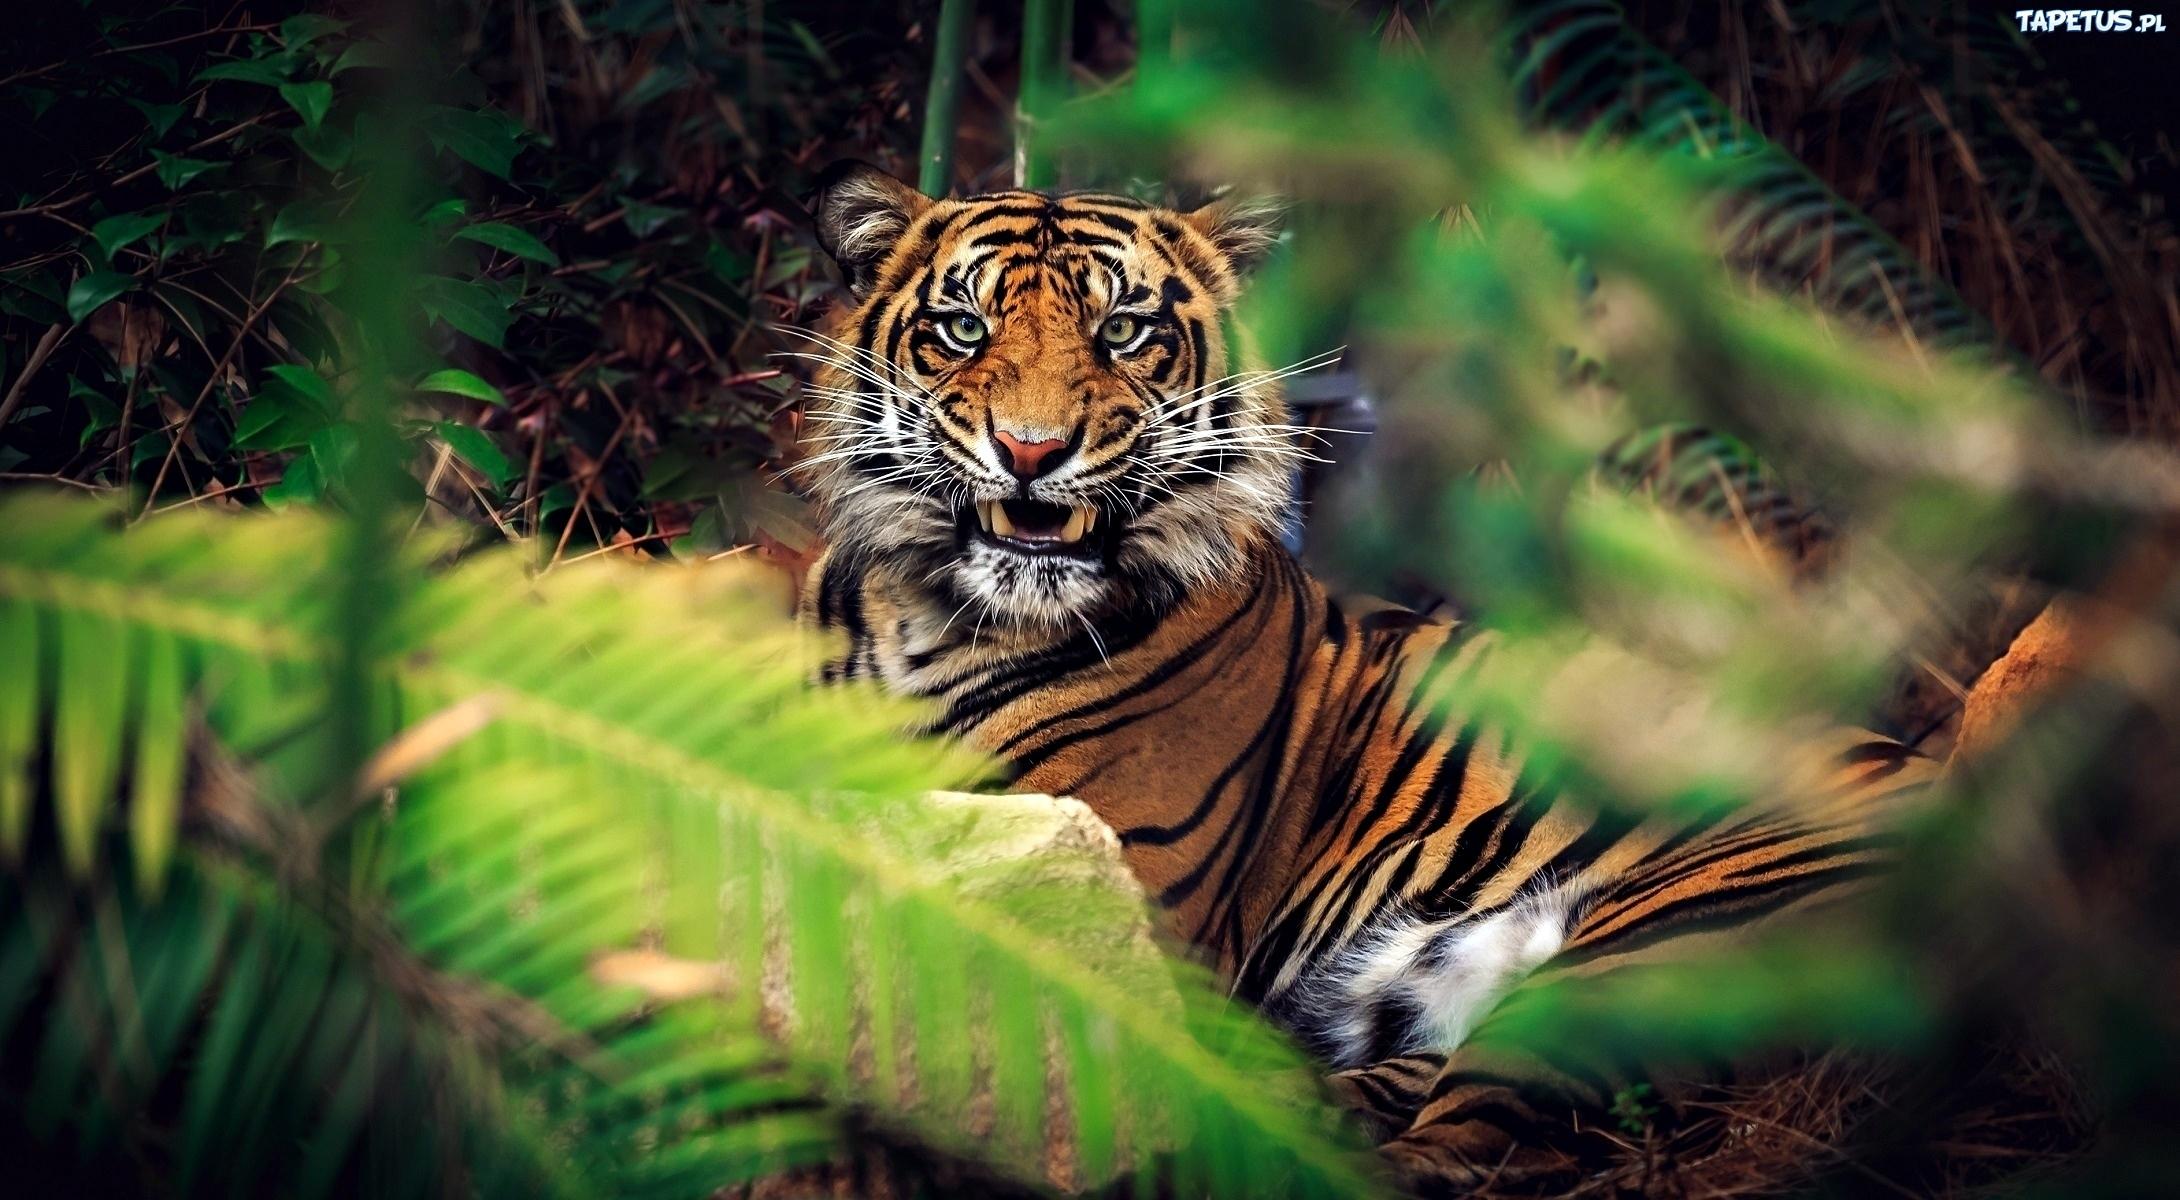 природа животные тигры nature animals tigers  № 1297218 бесплатно